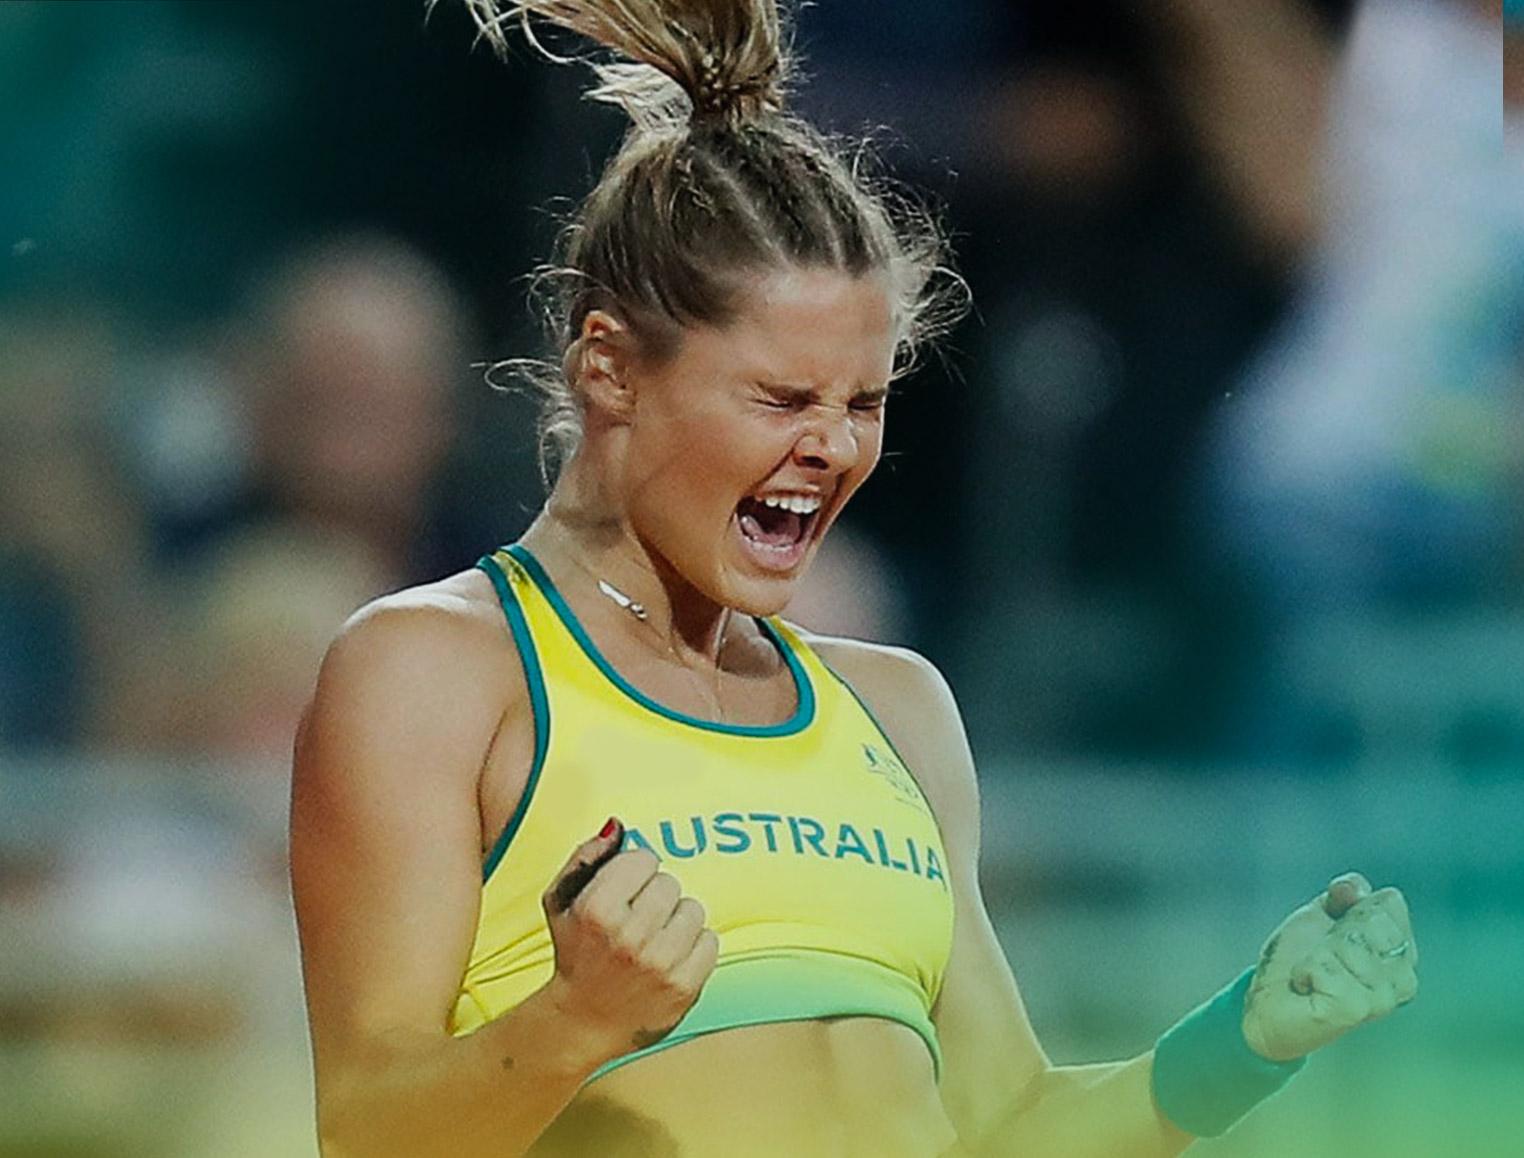 Australian Athletics tile image